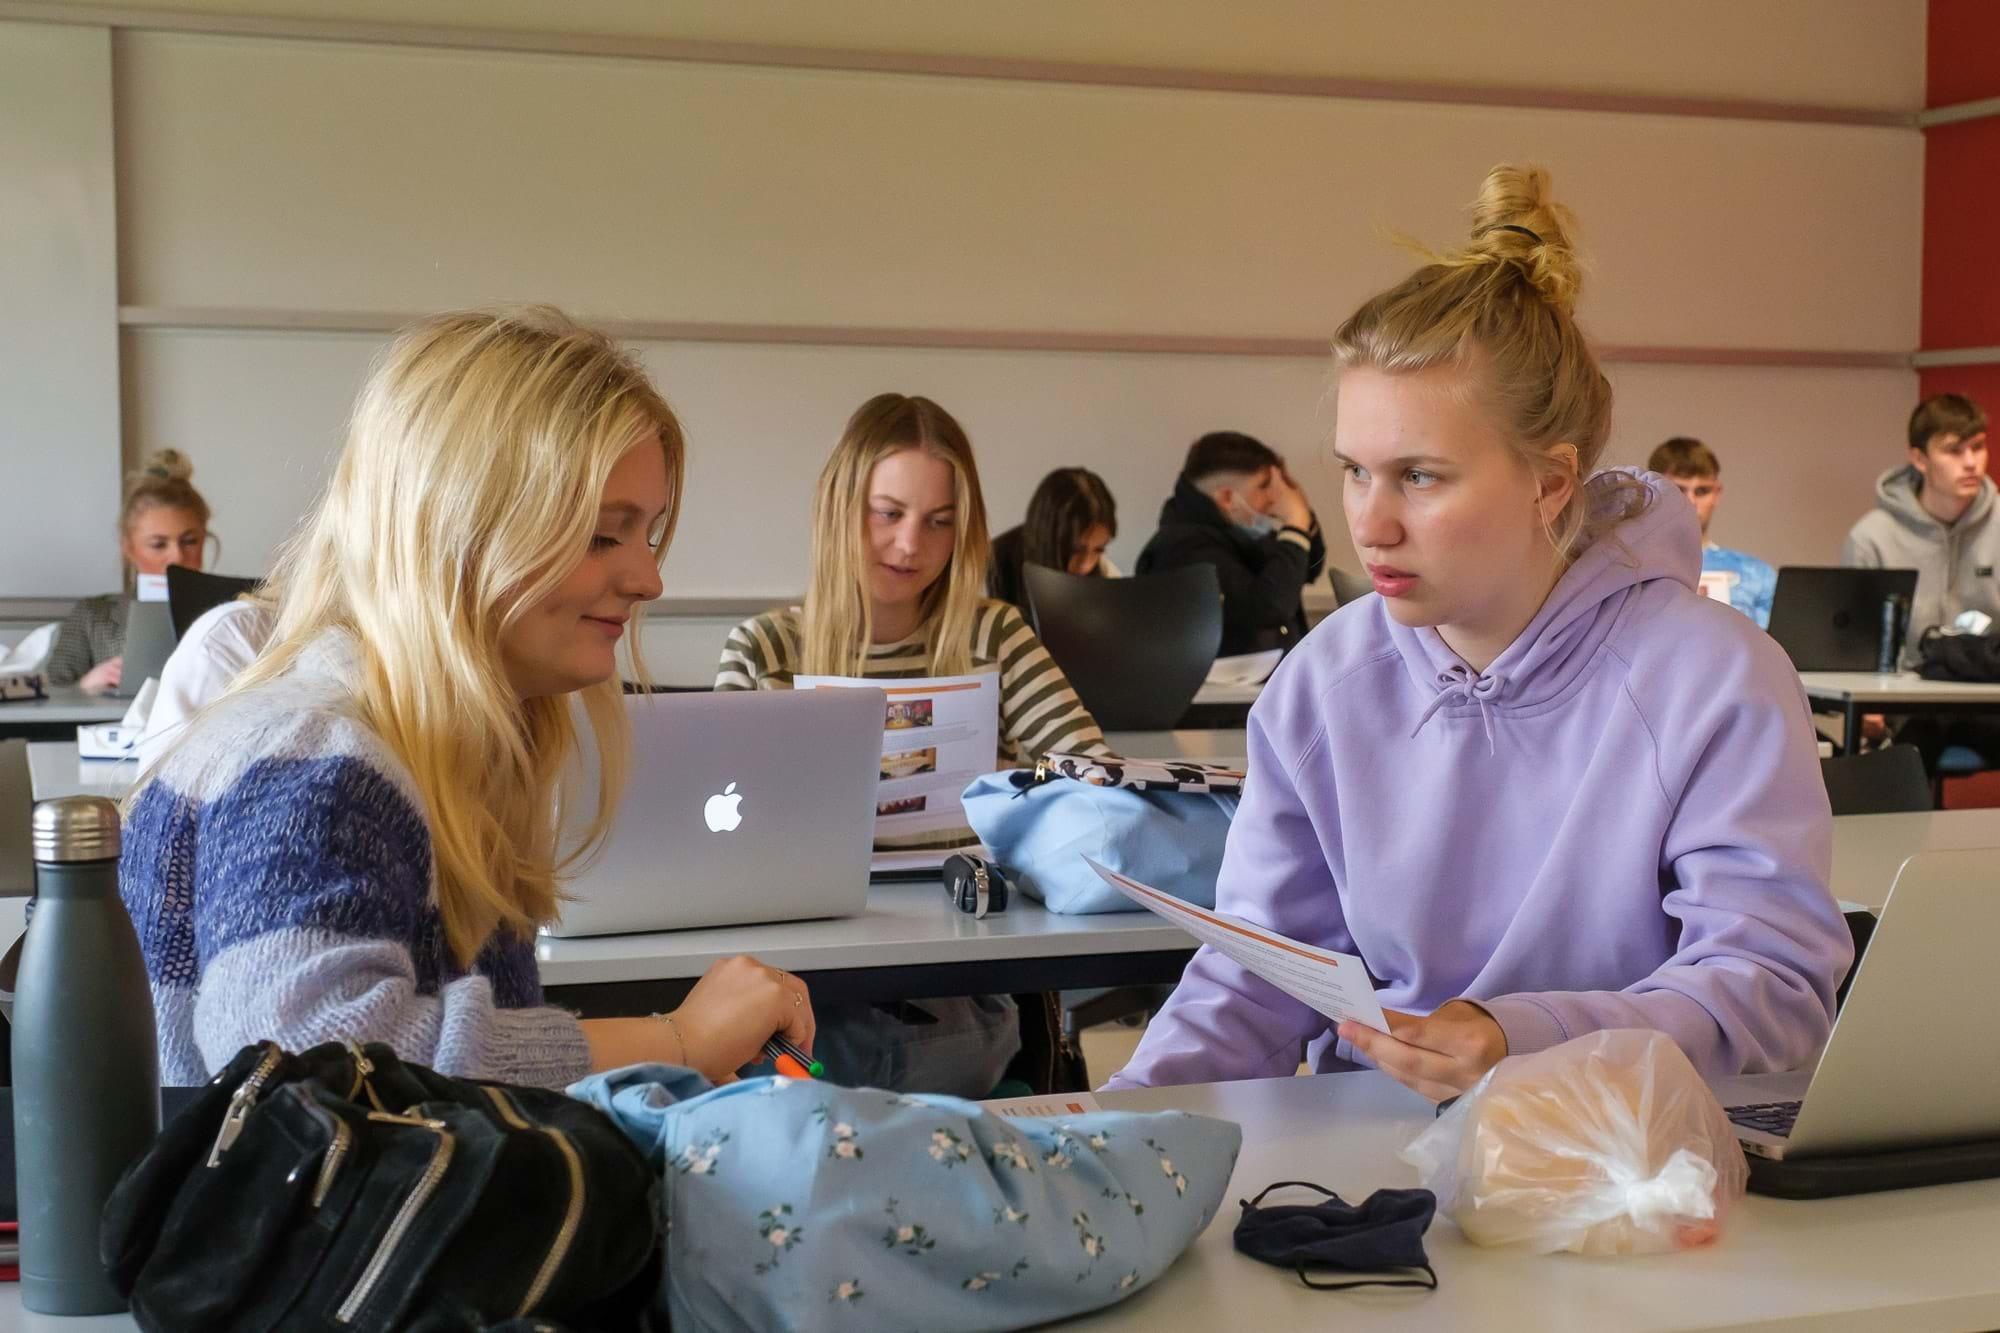 To piger laver gruppearbejde